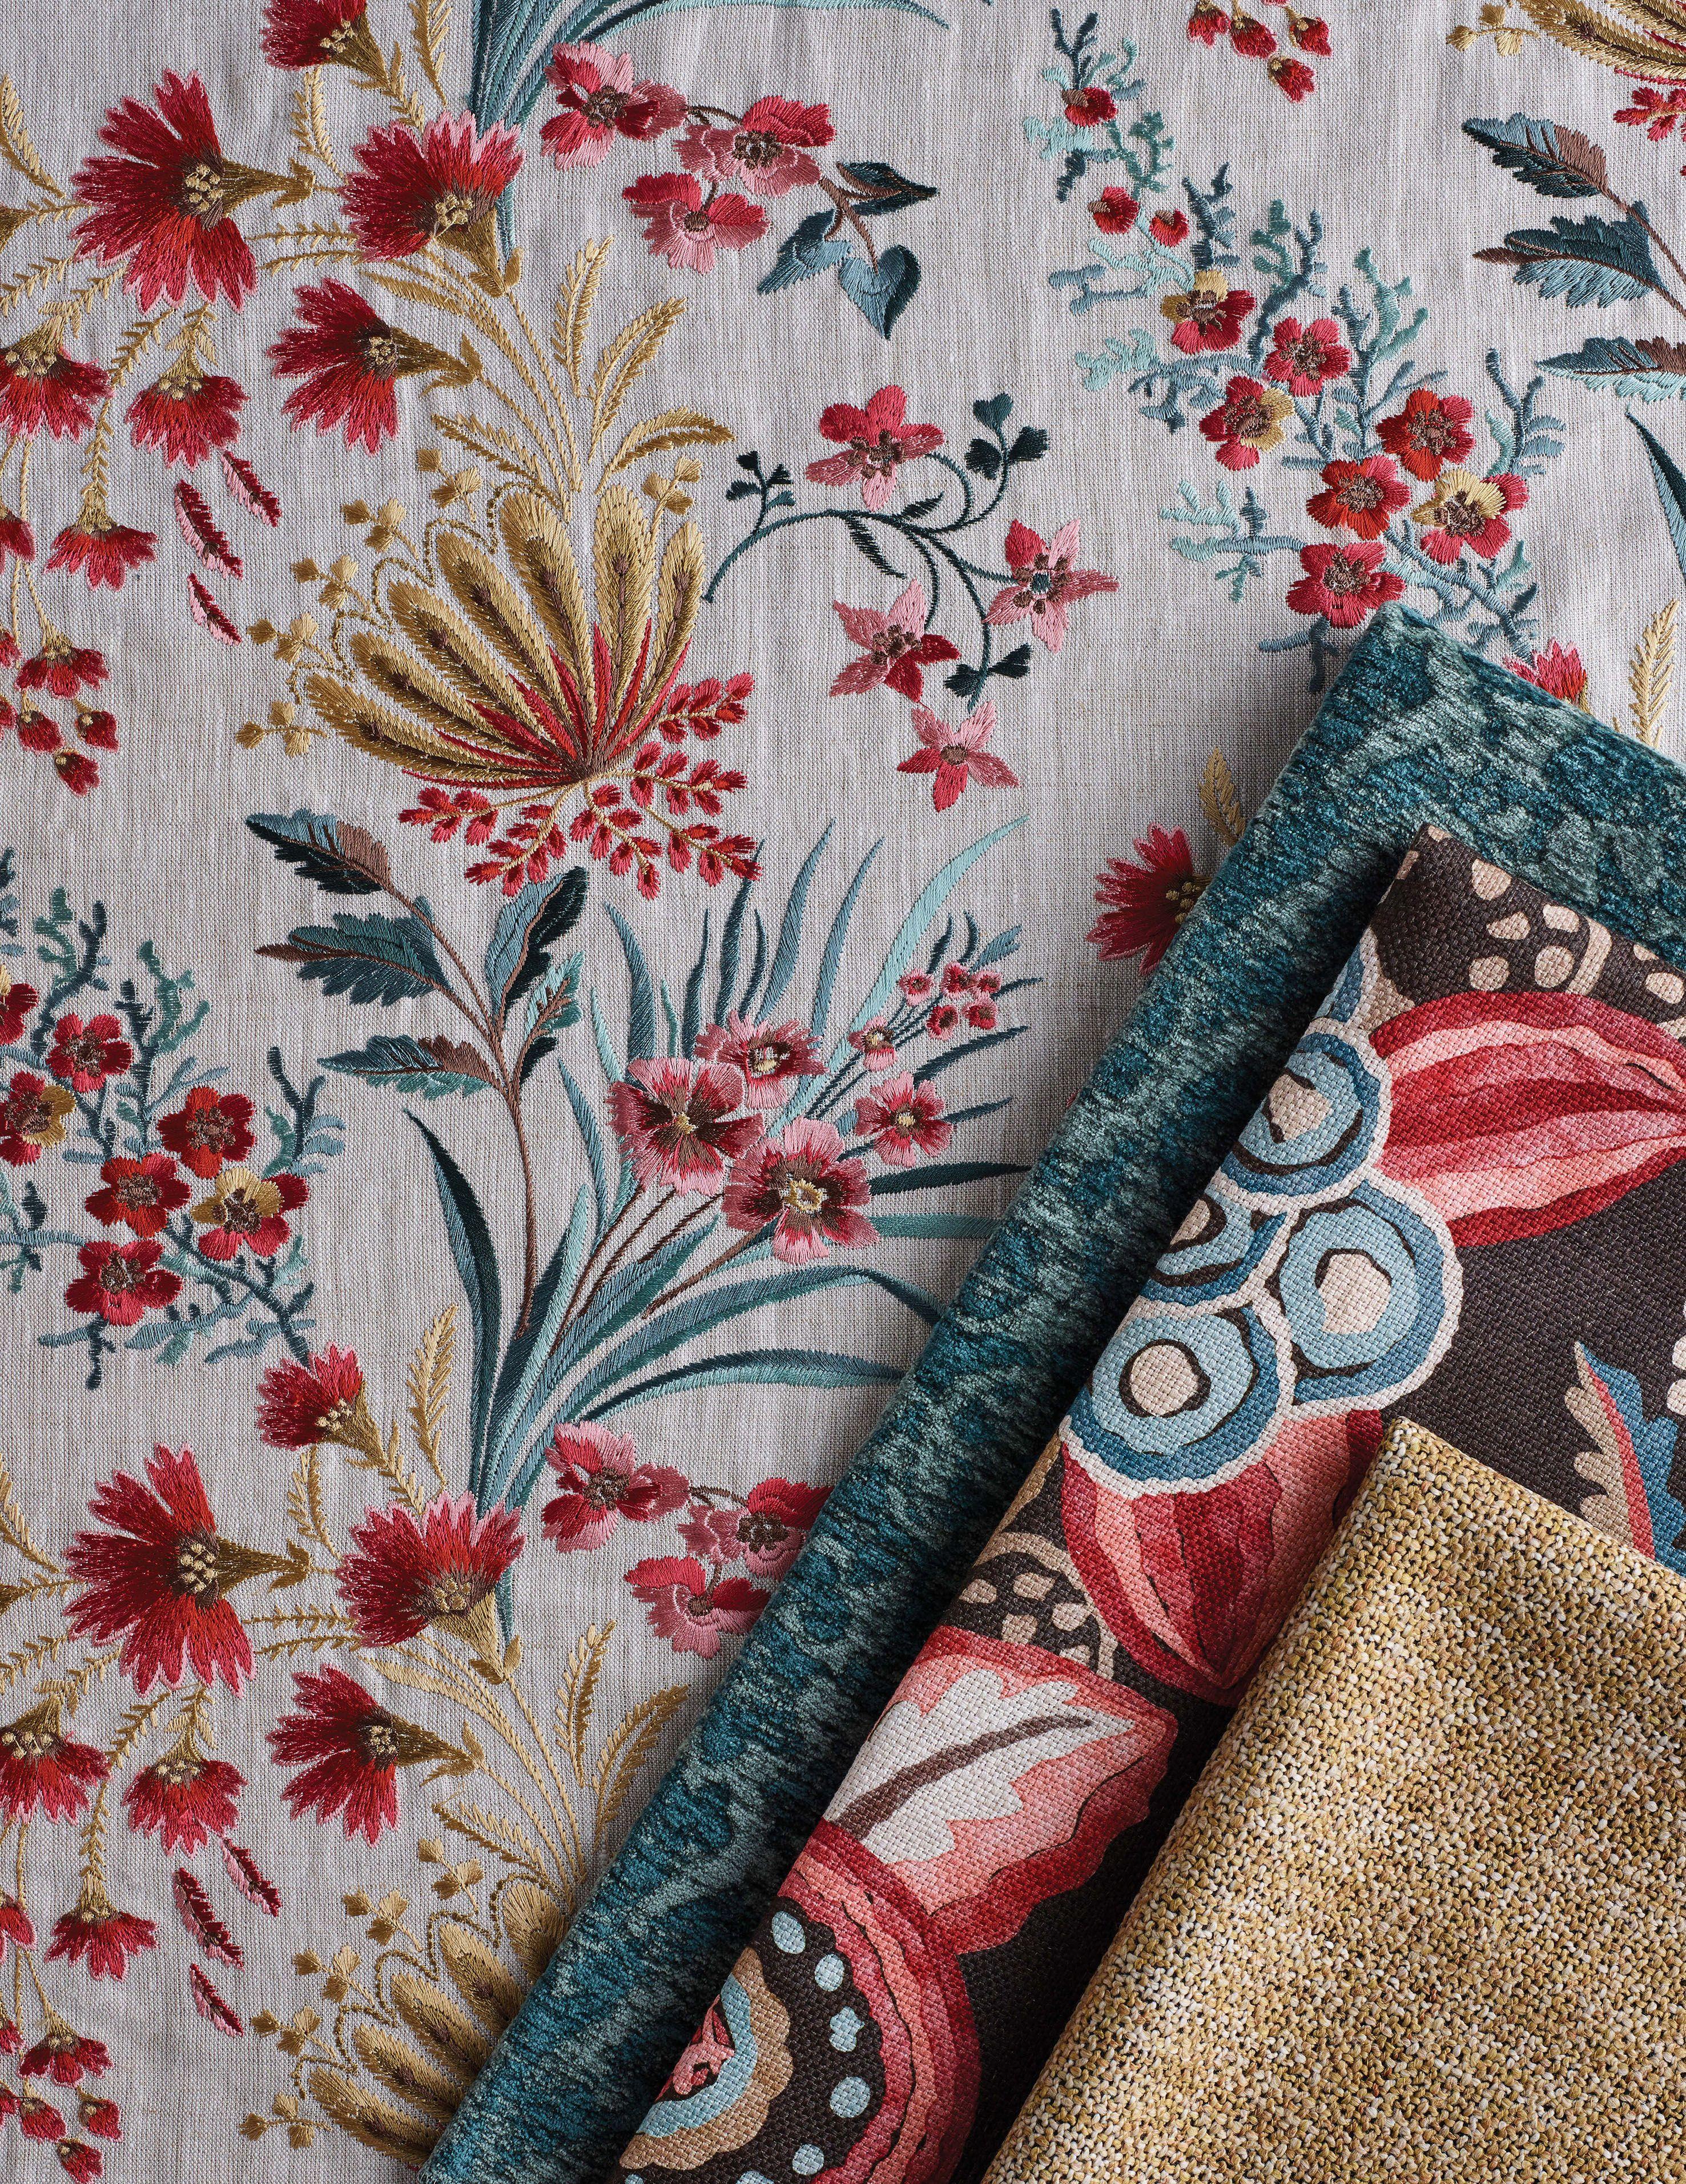 Michelham Pretty embroidery, Floral spray, Prints